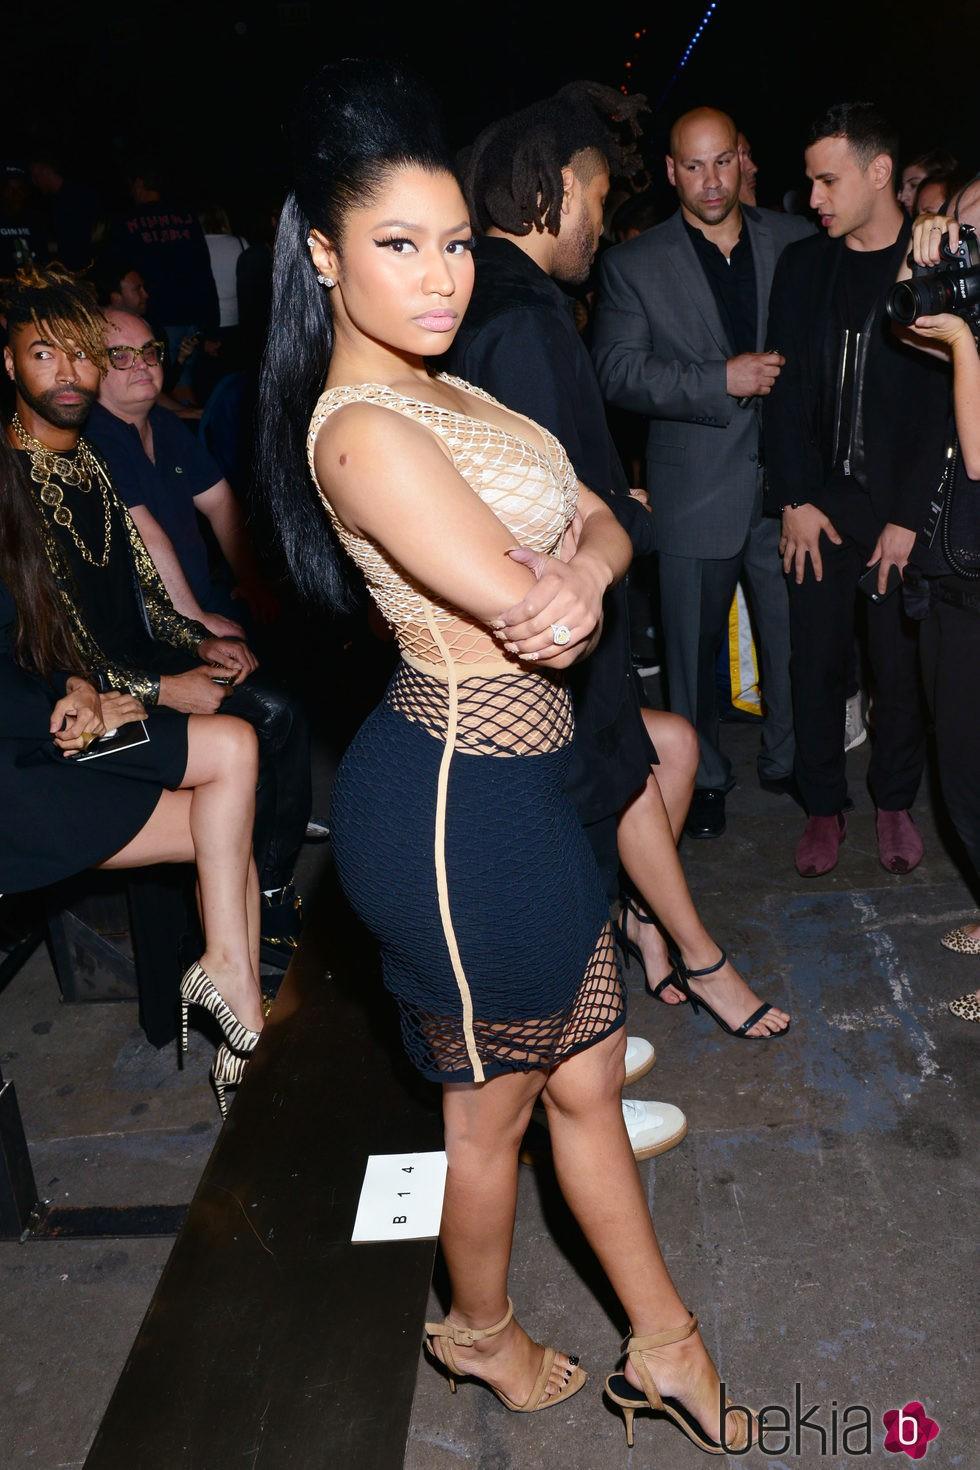 Nicki Minaj en el front row de la Nueva York Fashion Week primavera/verano 2016